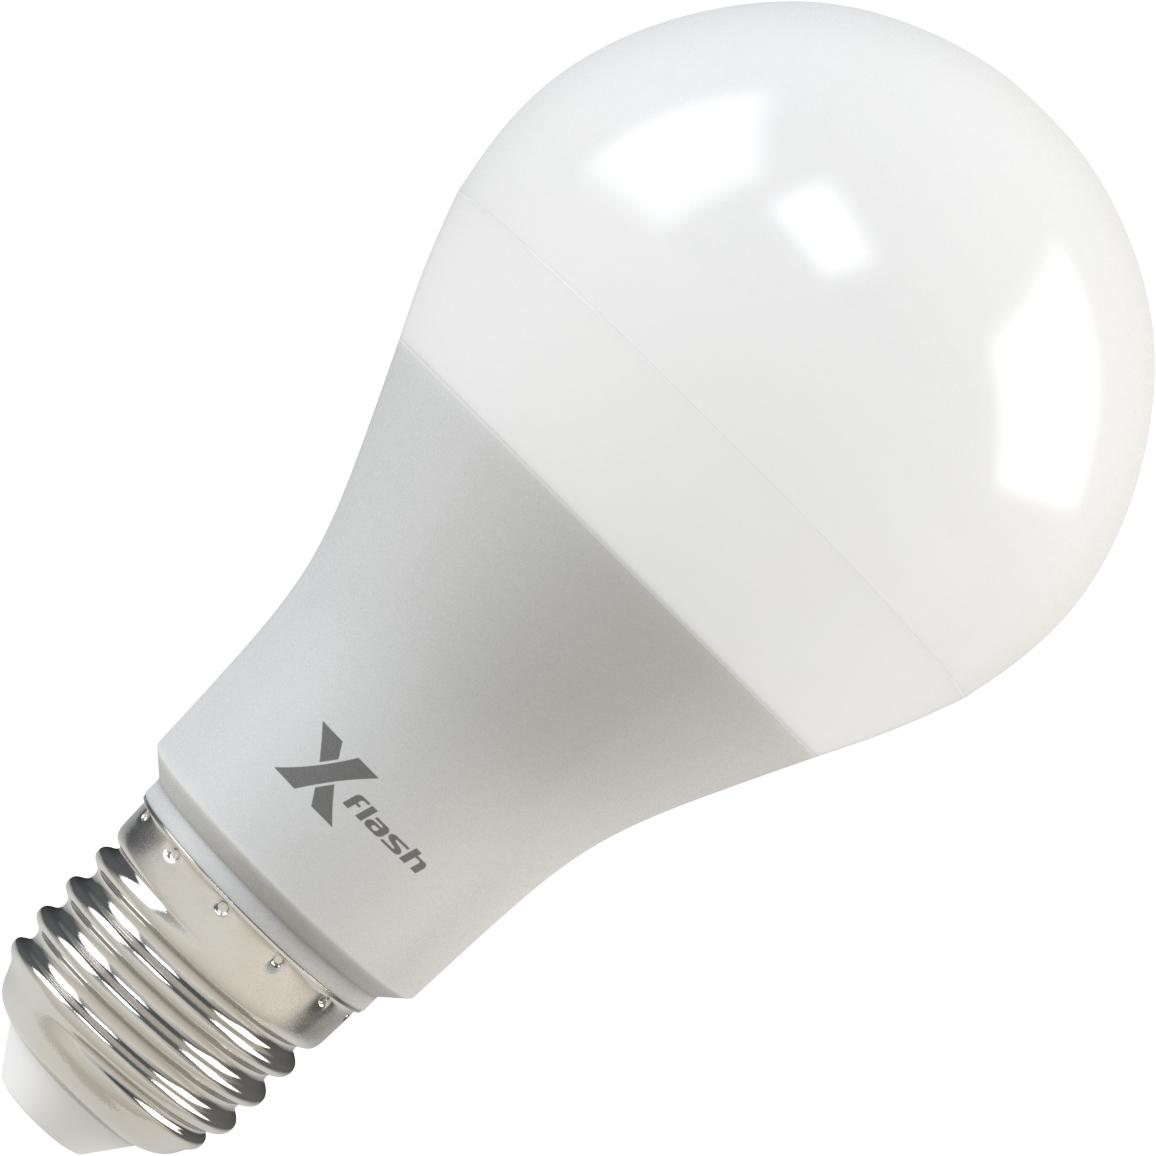 Лампа светодиодная X-flash Xf-e27-a65-p-12w-4000k-12v 10шт